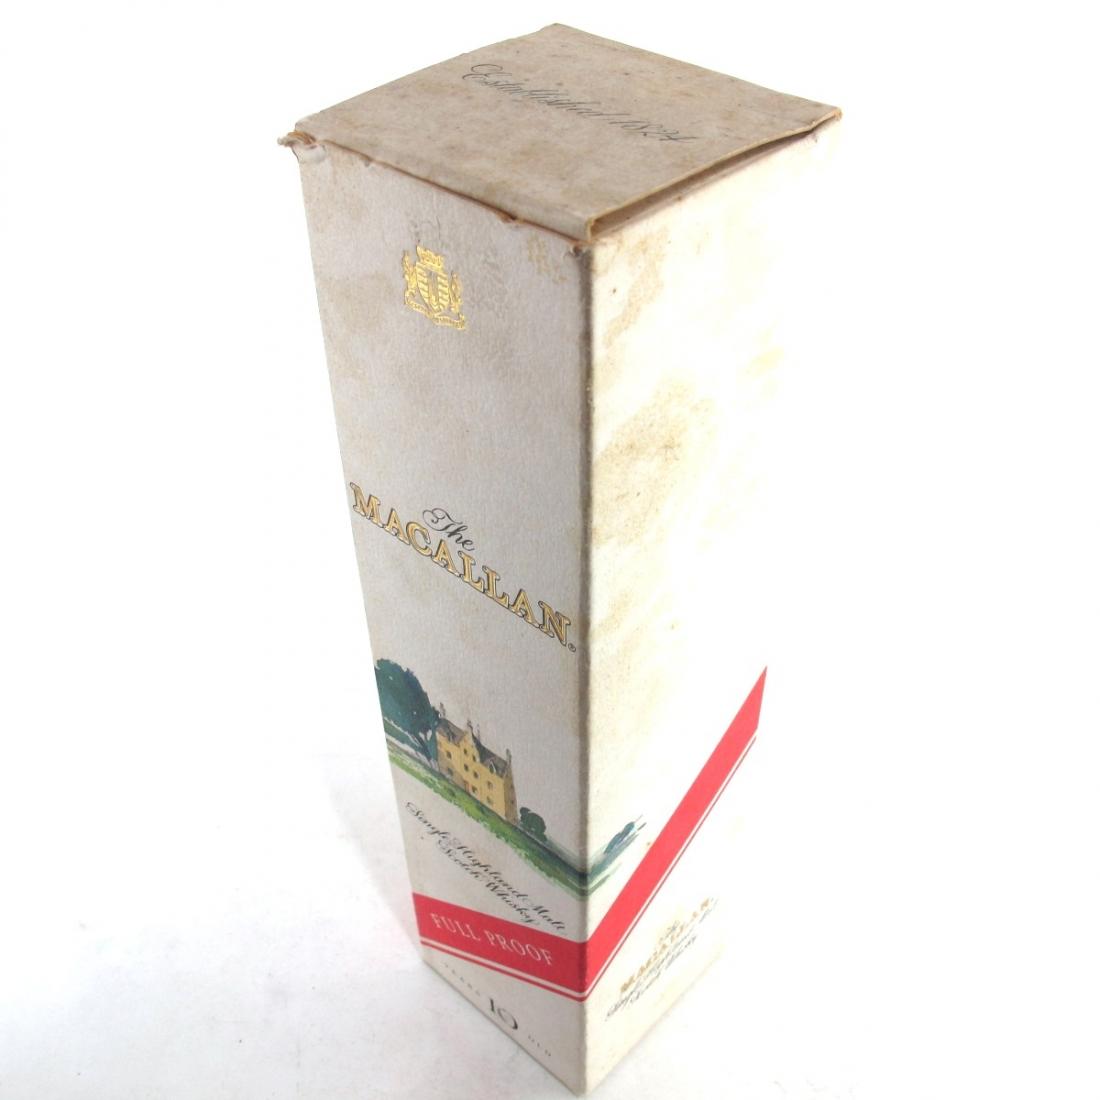 Macallan 10 Year Old Full Proof 1980s / Giovinetti Import